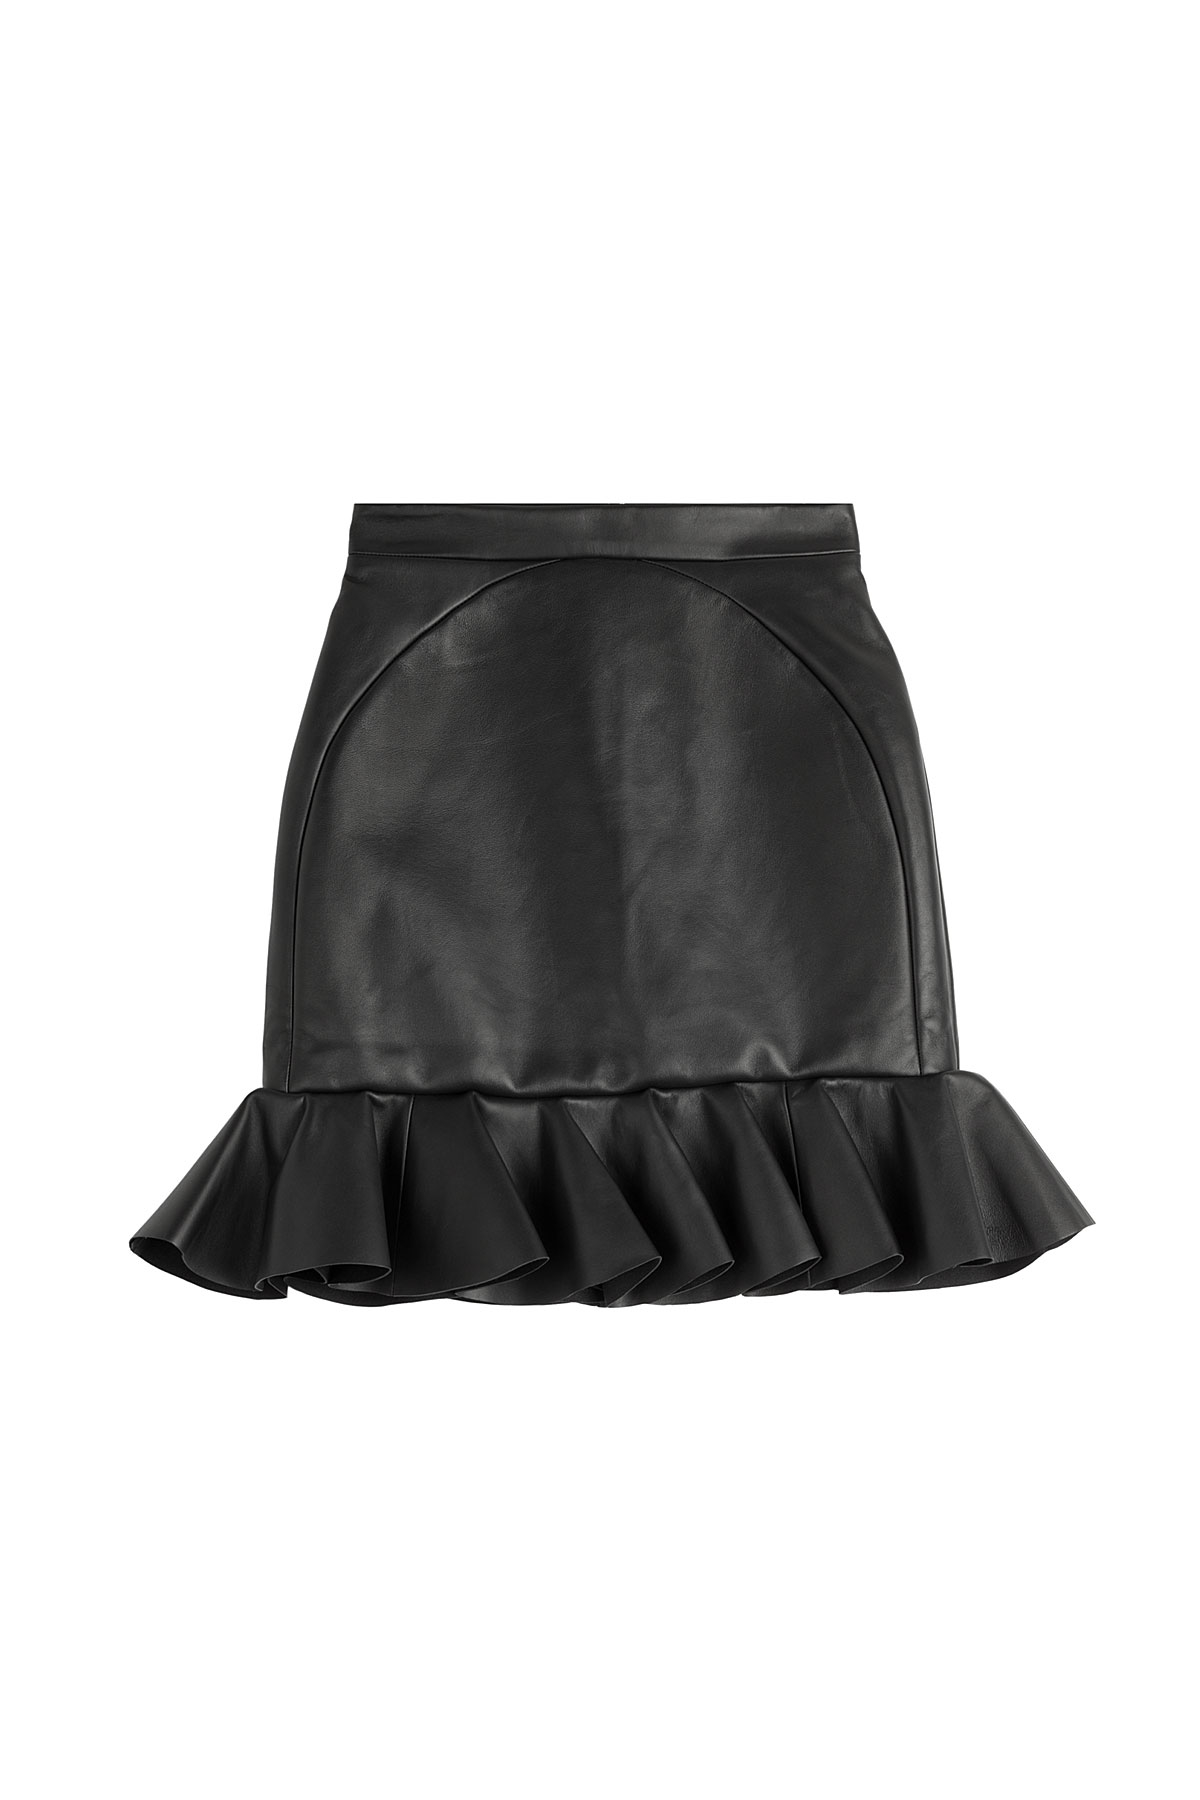 david koma leather ruffle hem mini skirt black in black